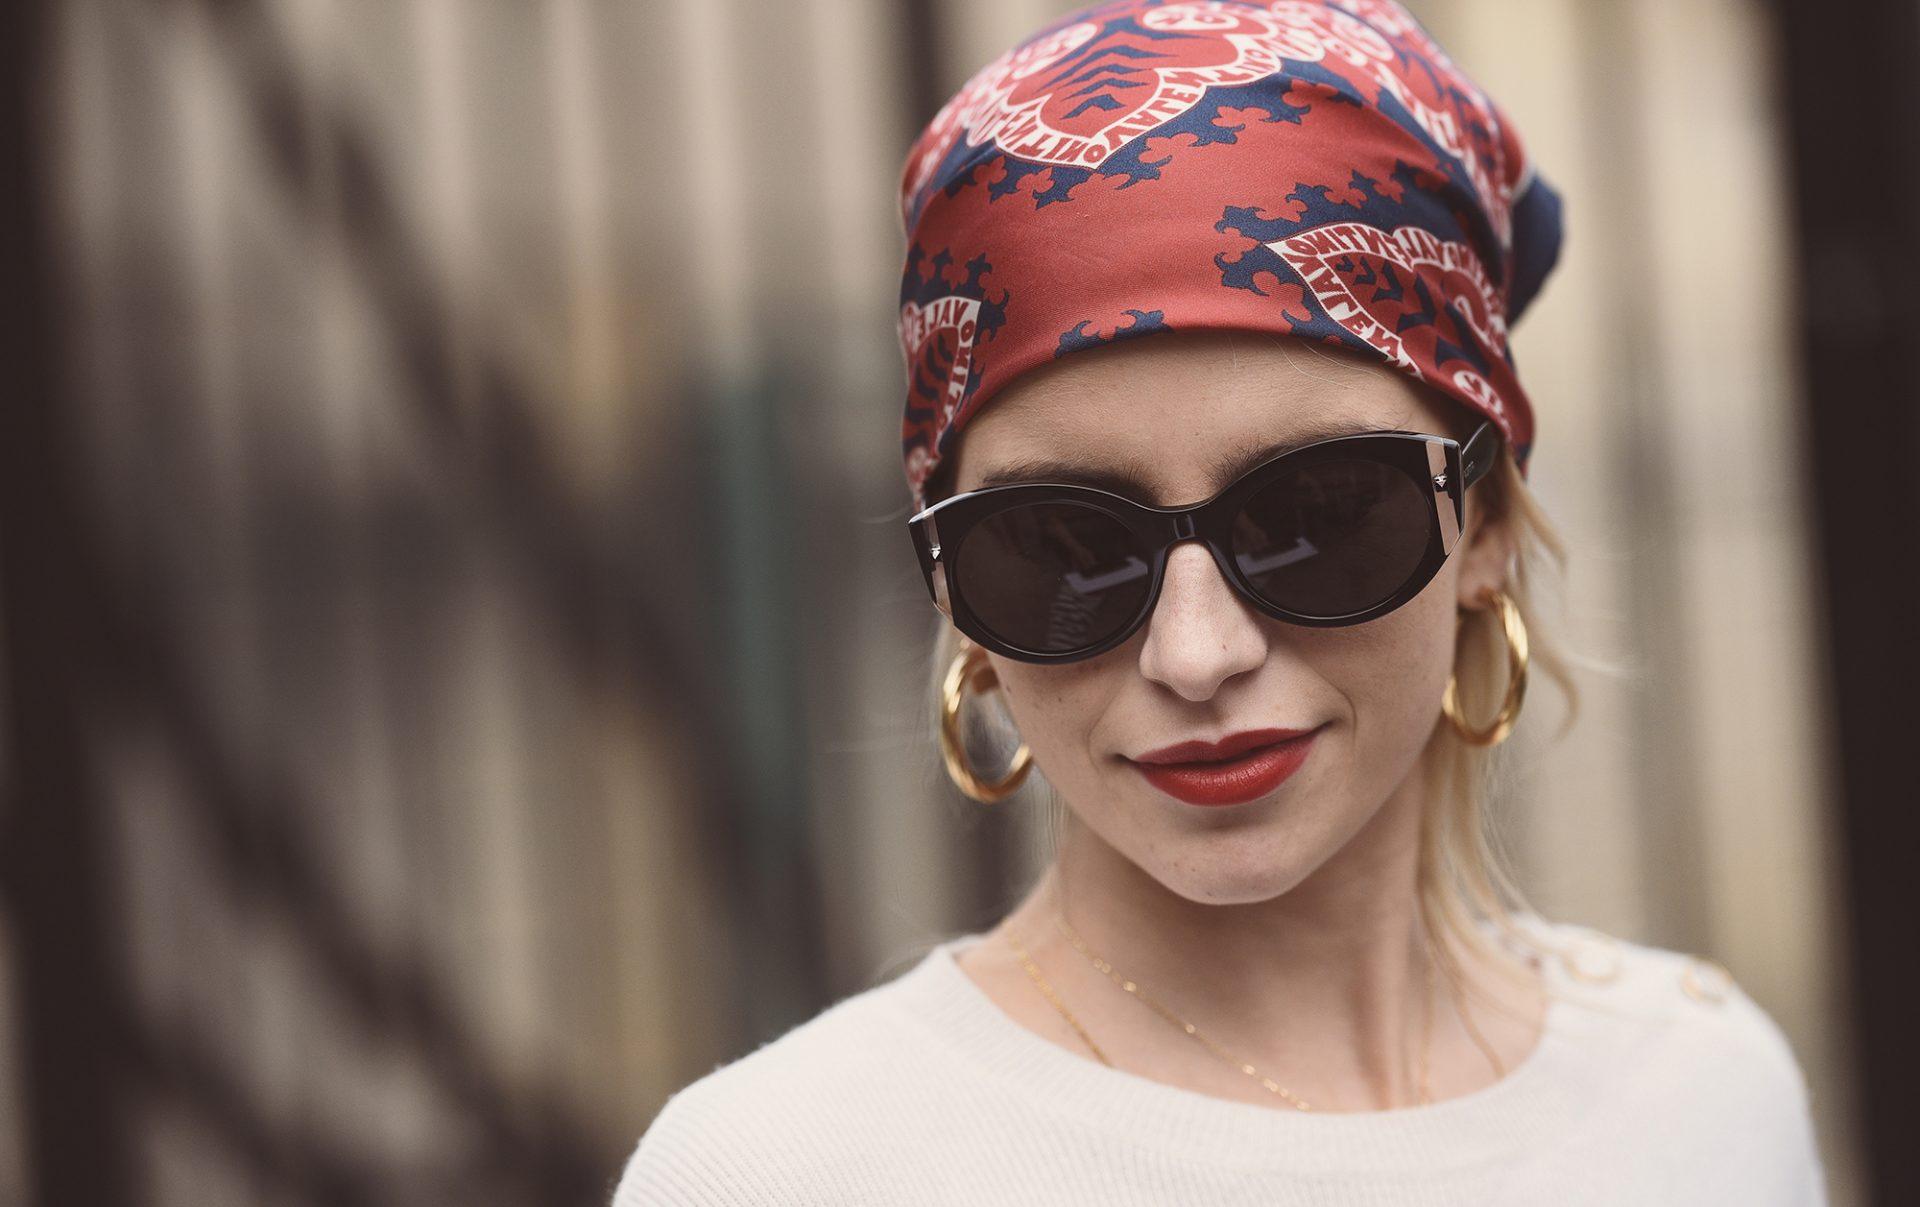 femme qui porte un foulard de mode